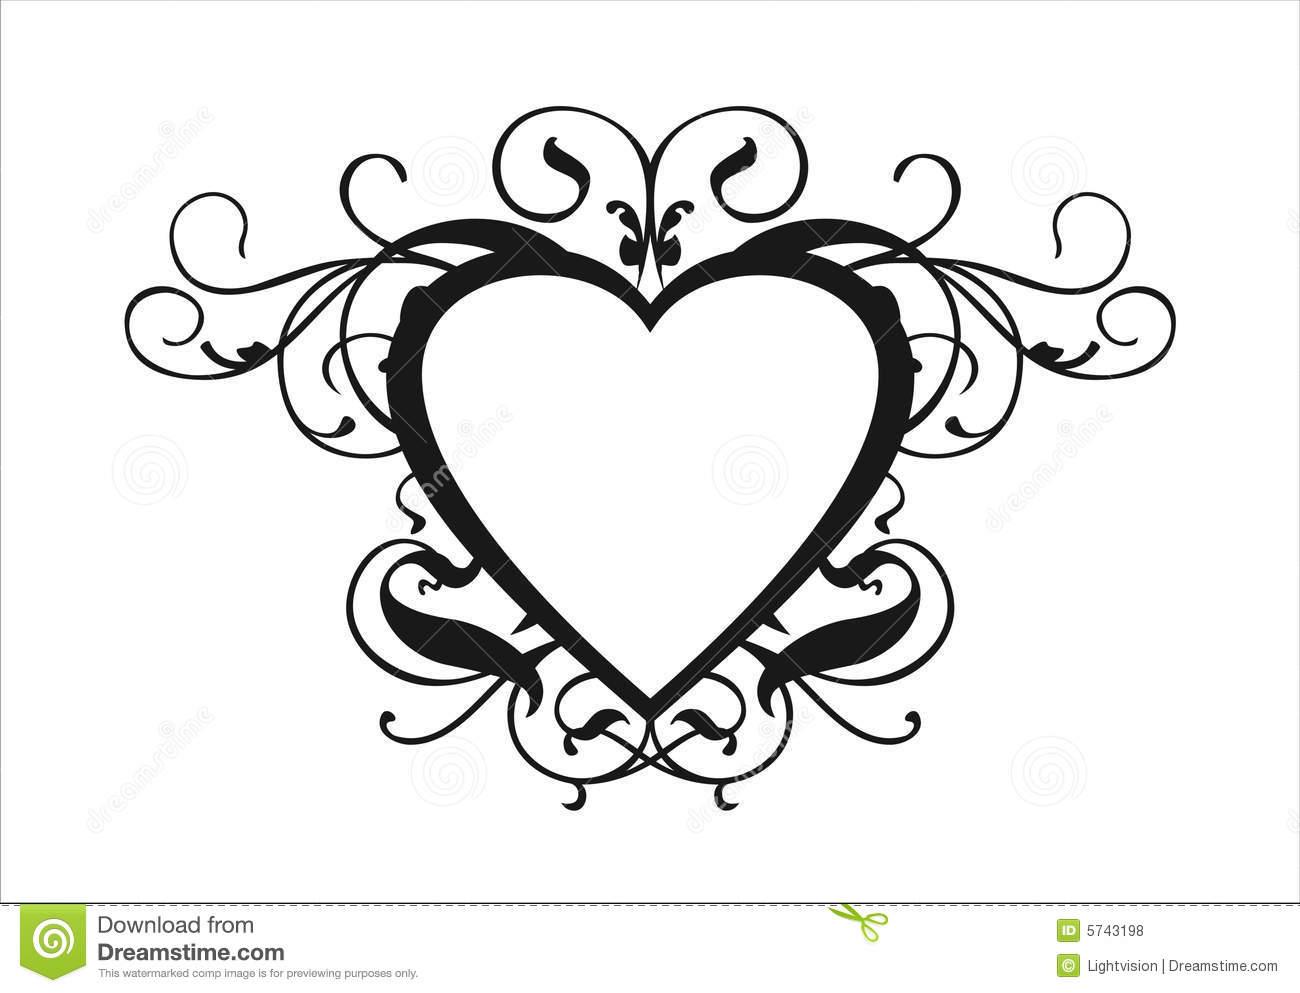 Wedding hearts clip art free Wedding heart clipart free gray - ClipartFest free